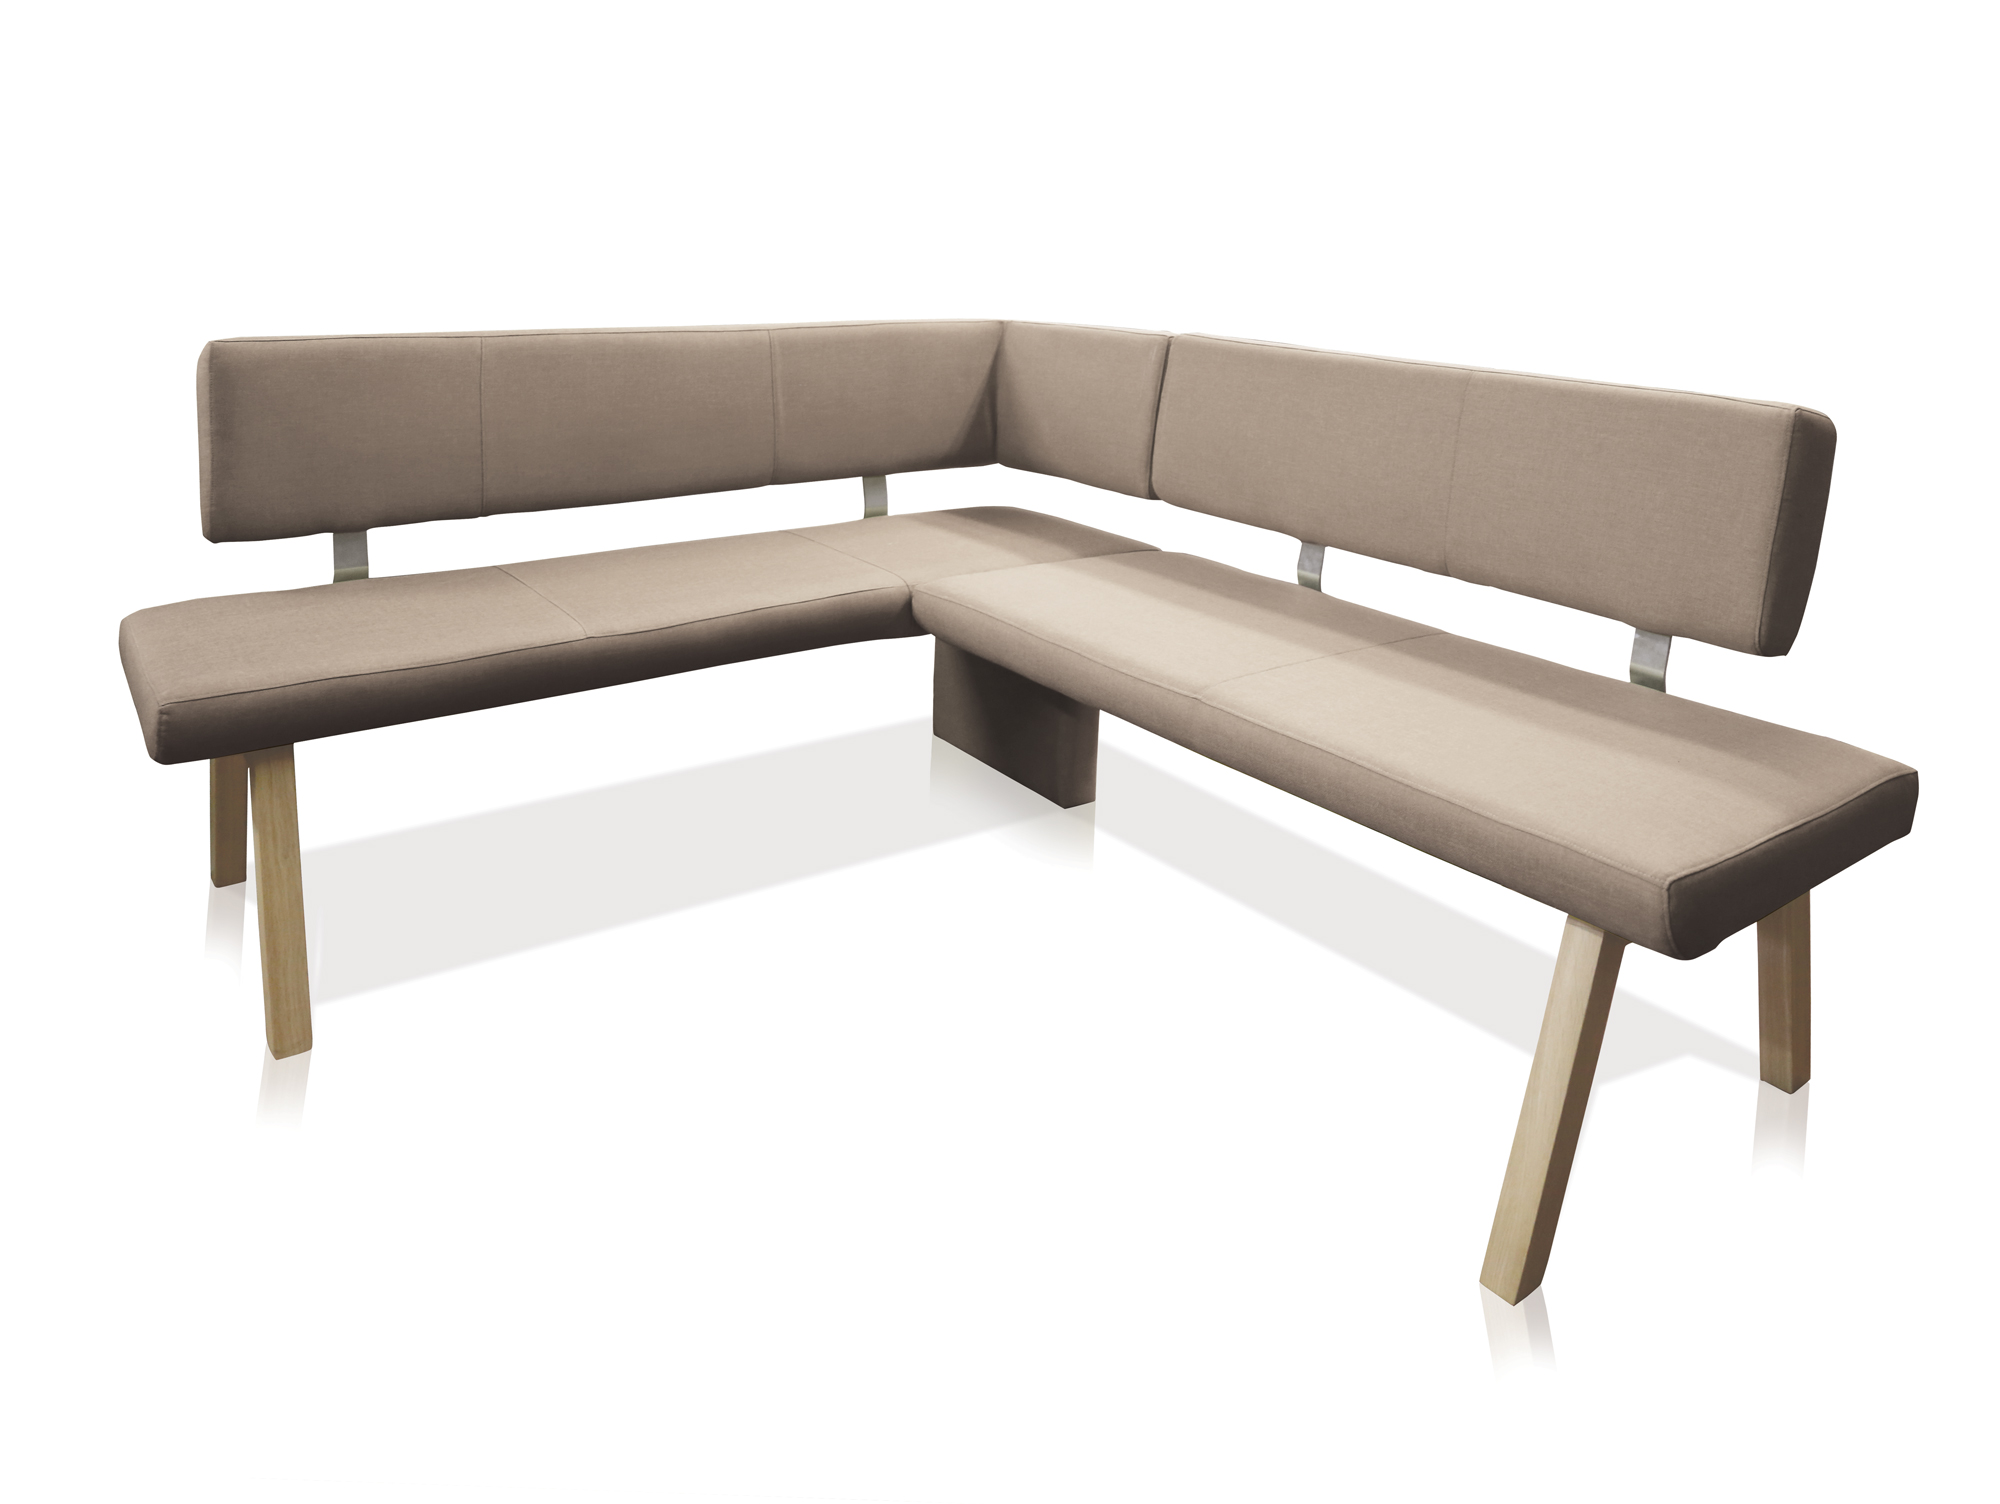 koby eckbank mit stoffbezug taupe links 192 x 161 cm. Black Bedroom Furniture Sets. Home Design Ideas